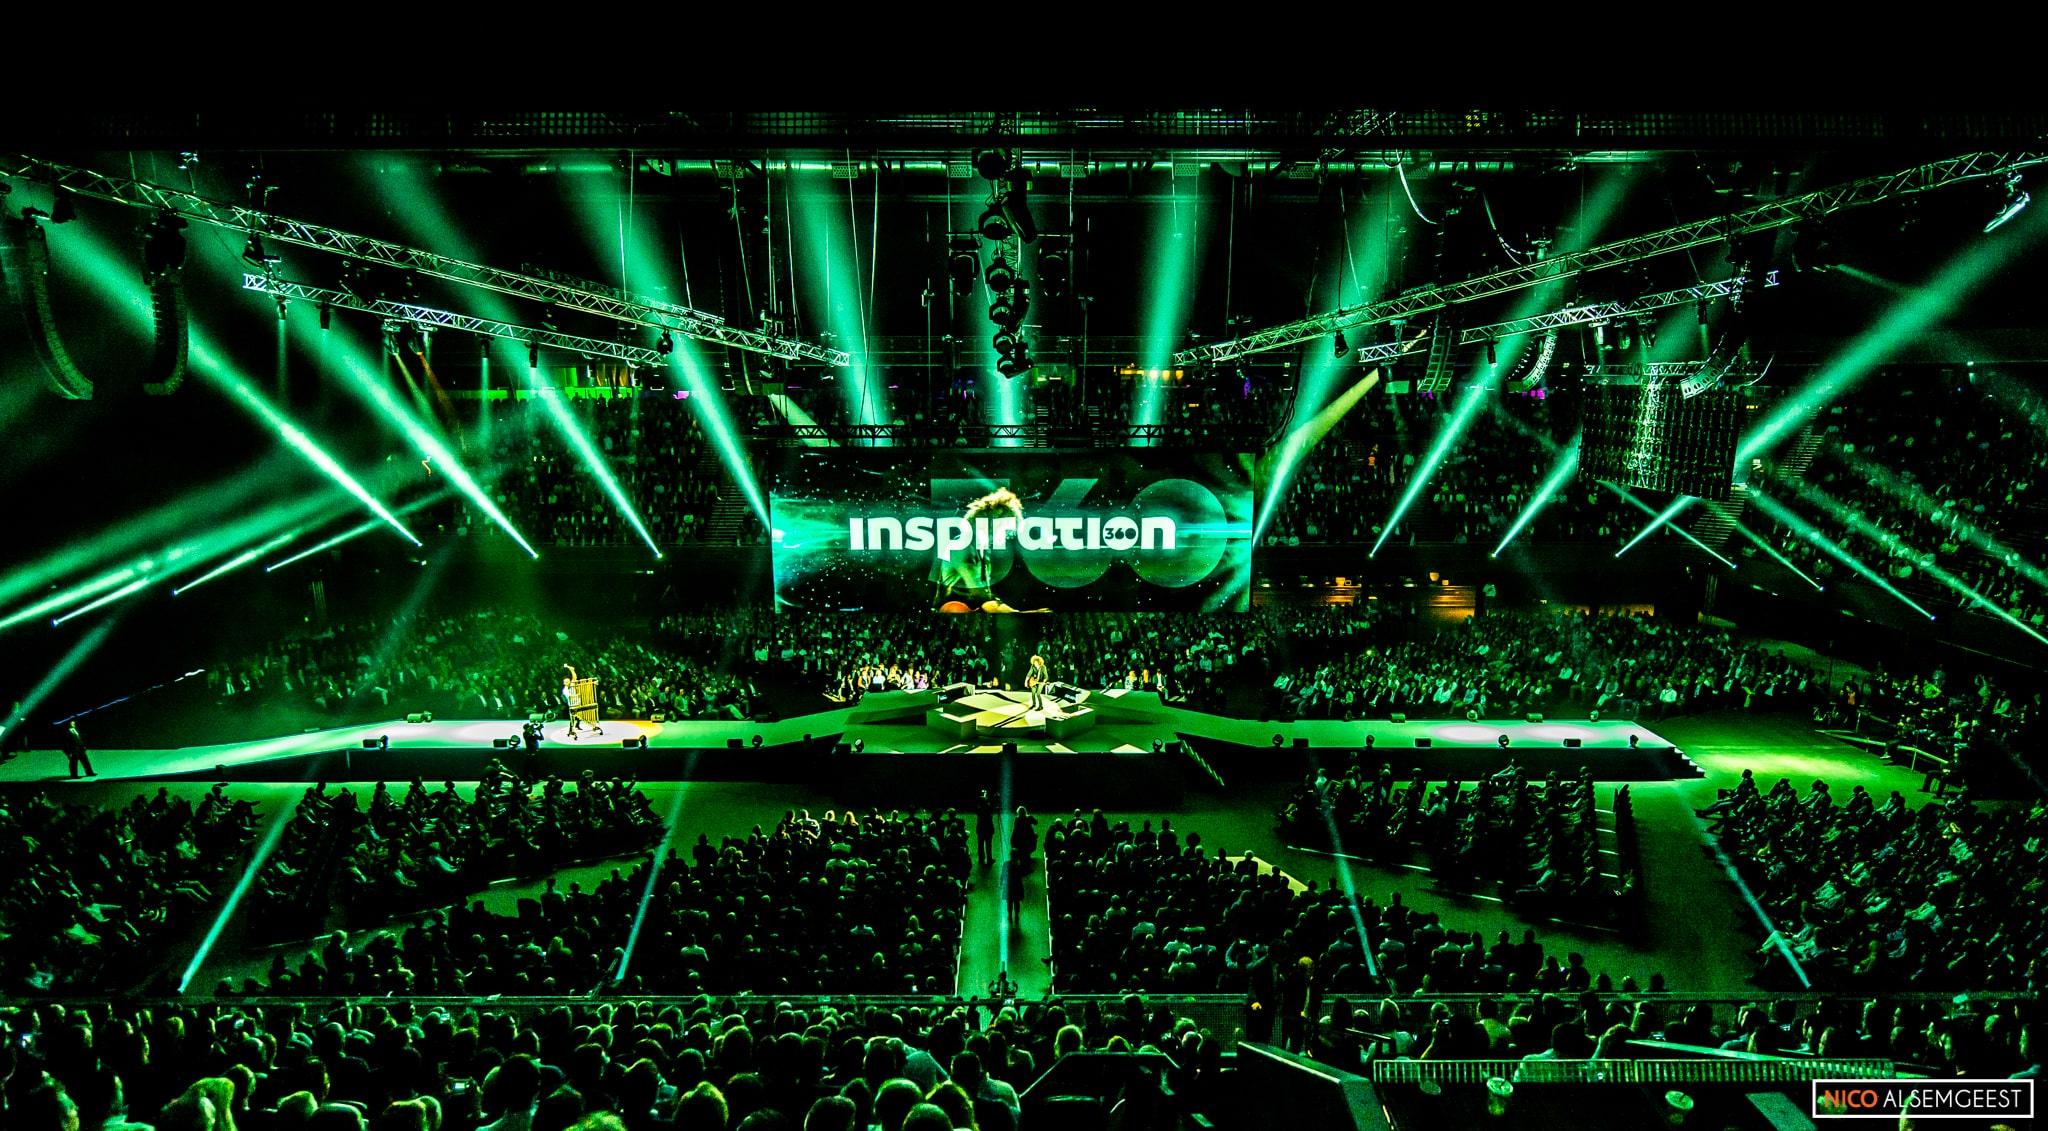 Inspiration 360 2016